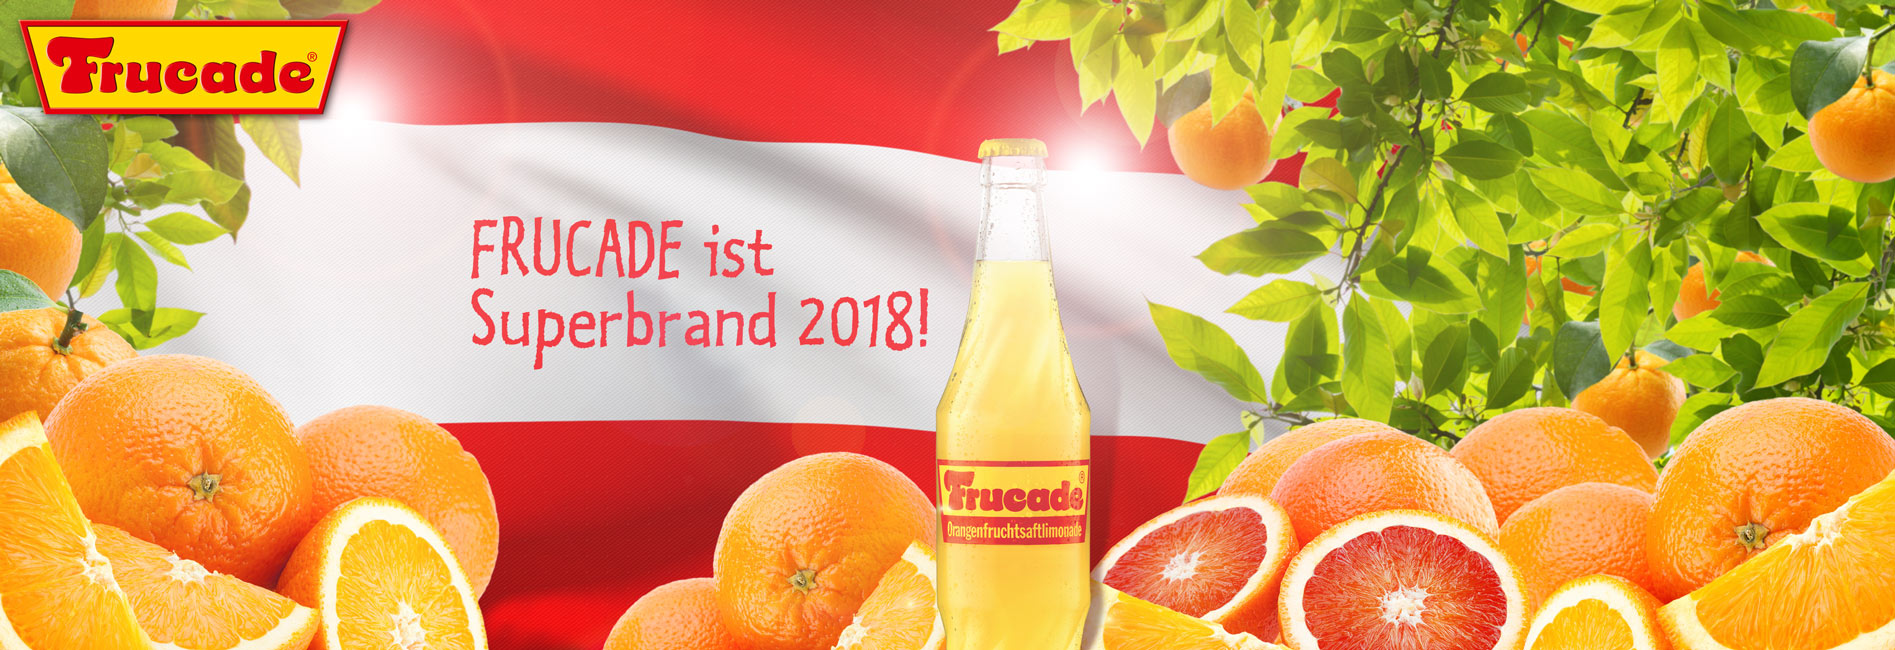 FRUCADE ist Superbrand 2018!!!